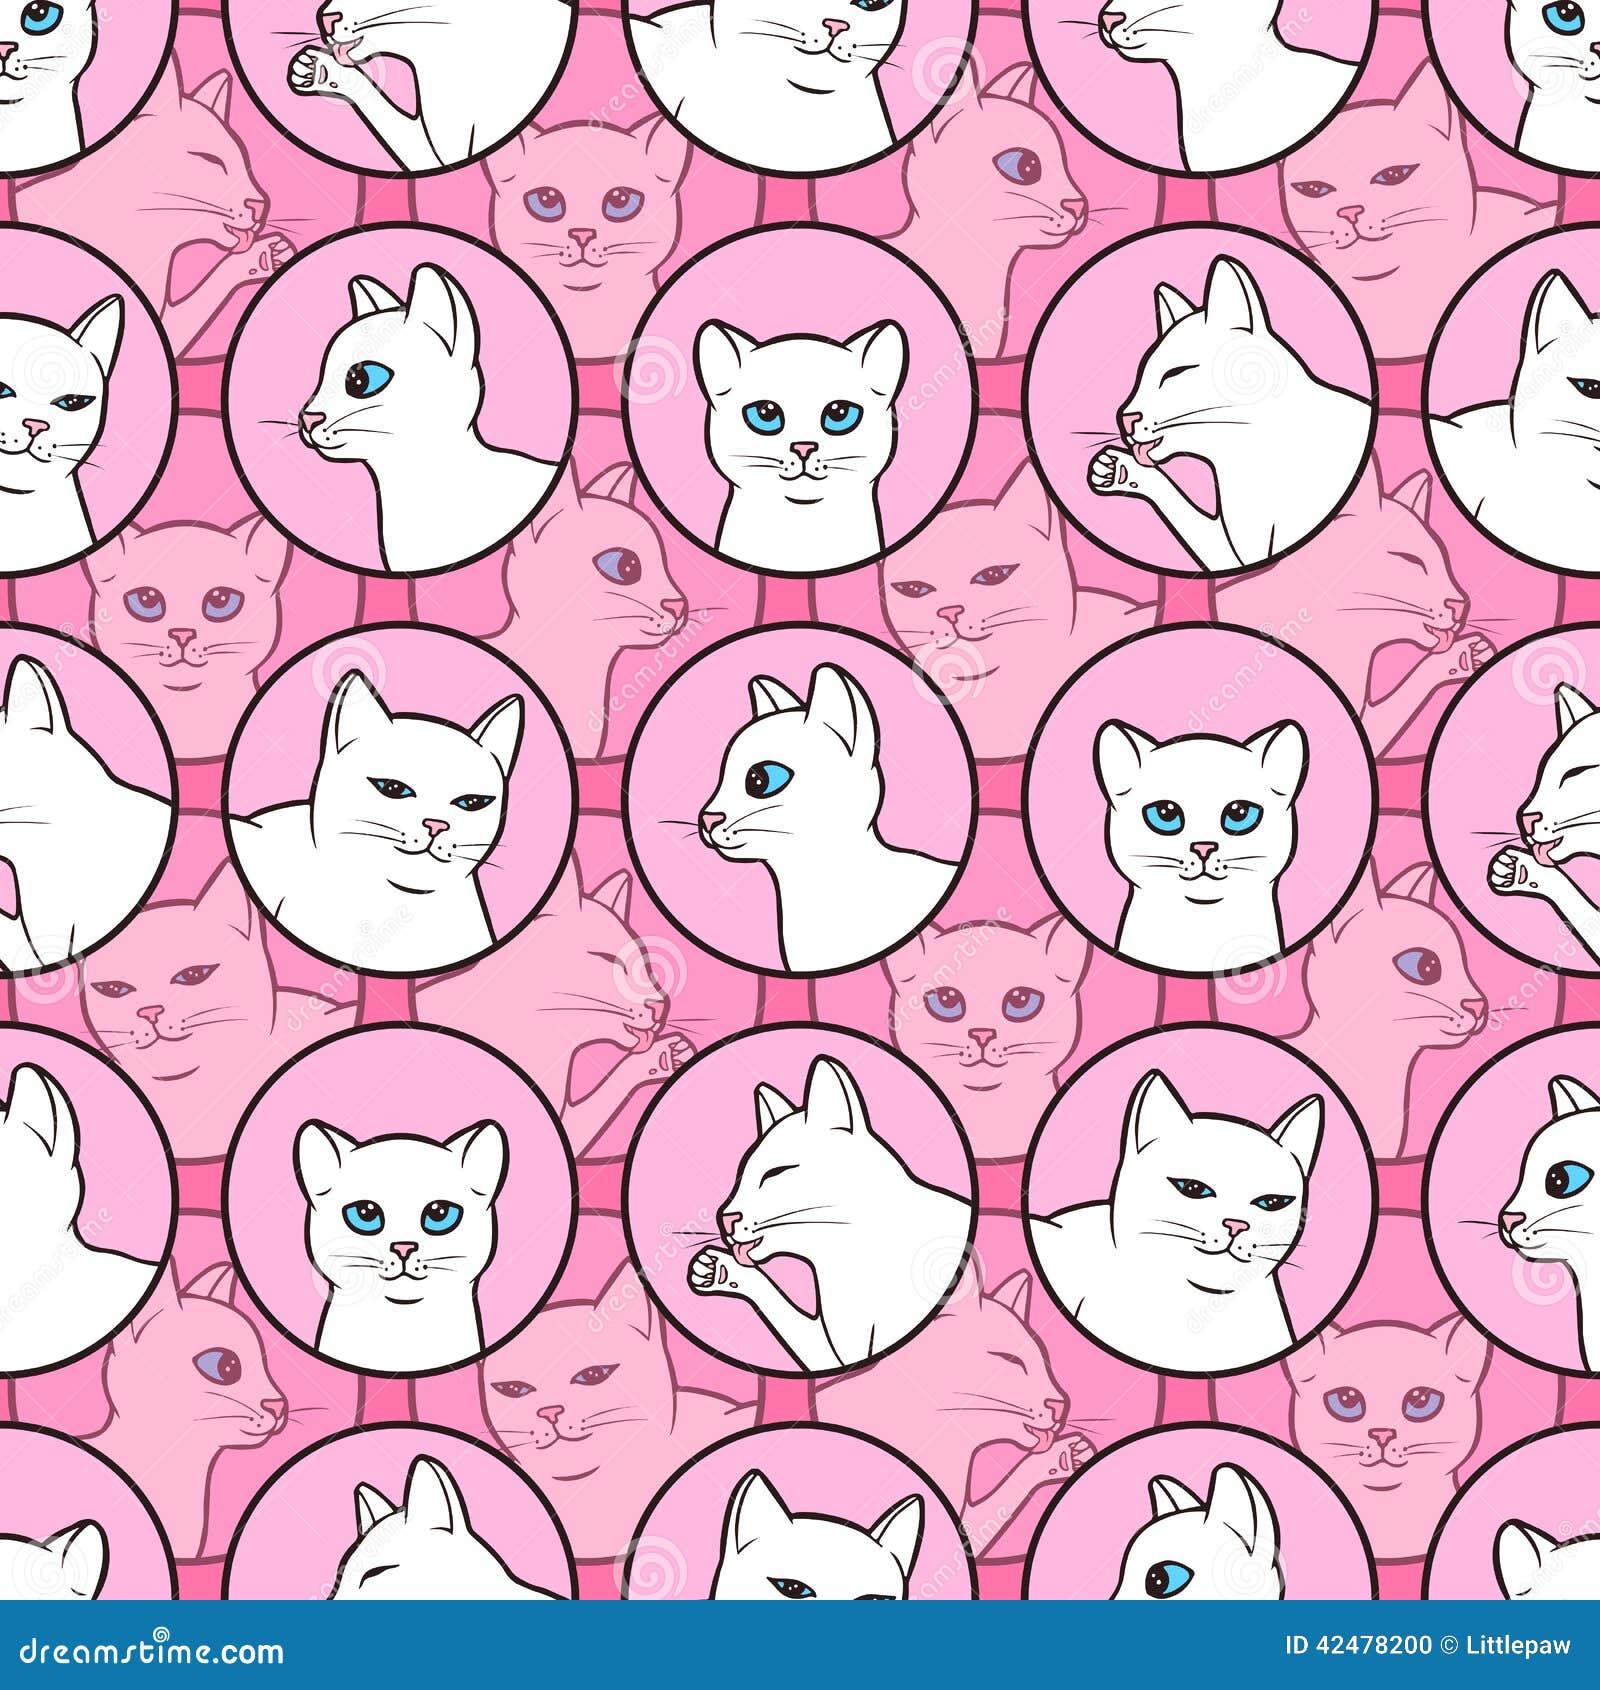 cute cat pattern wallpaper